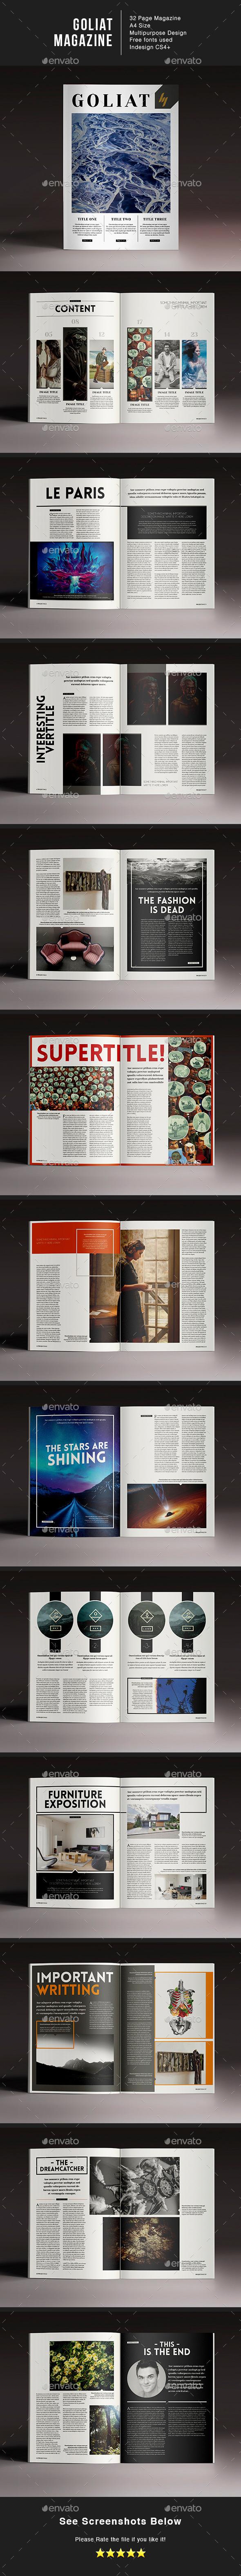 Goliat Magazine Indesign Template - Magazines Print Templates